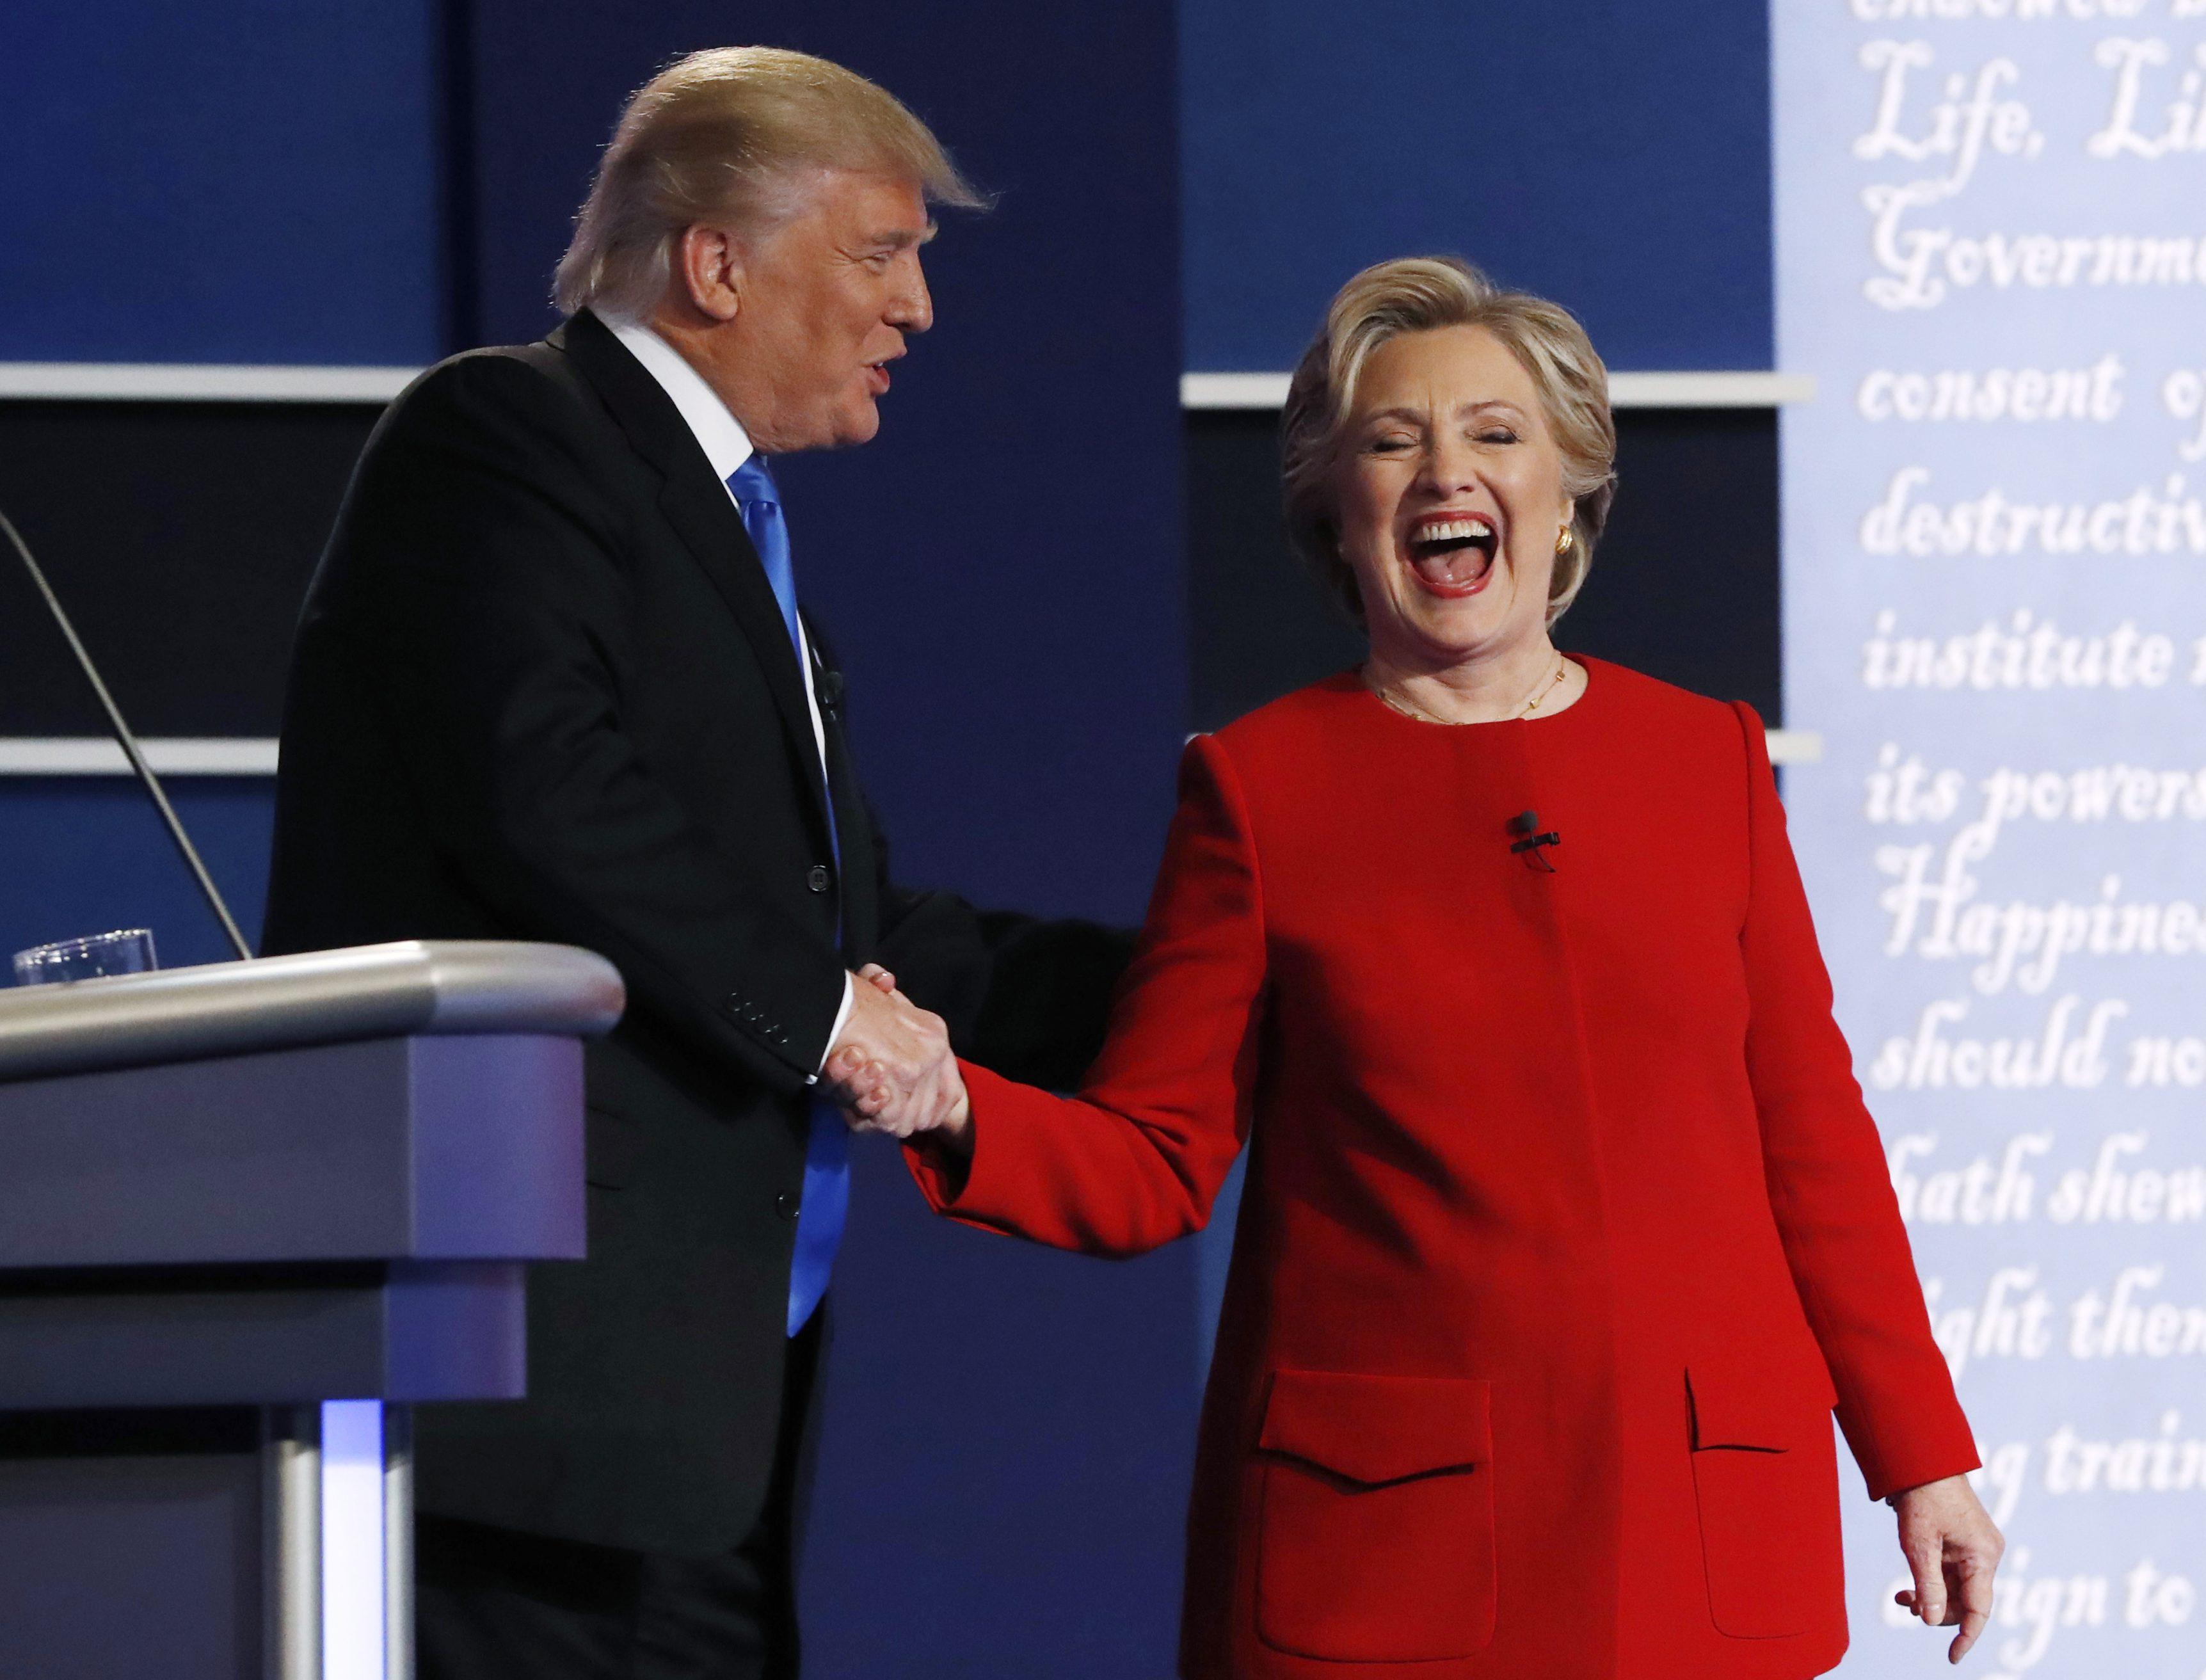 Republican U.S. presidential nominee Donald Trump greets Democratic U.S. presidential nominee Hillary Clinton after their first presidential debate at Hofstra University in Hempstead, New York, U.S., September 26, 2016.